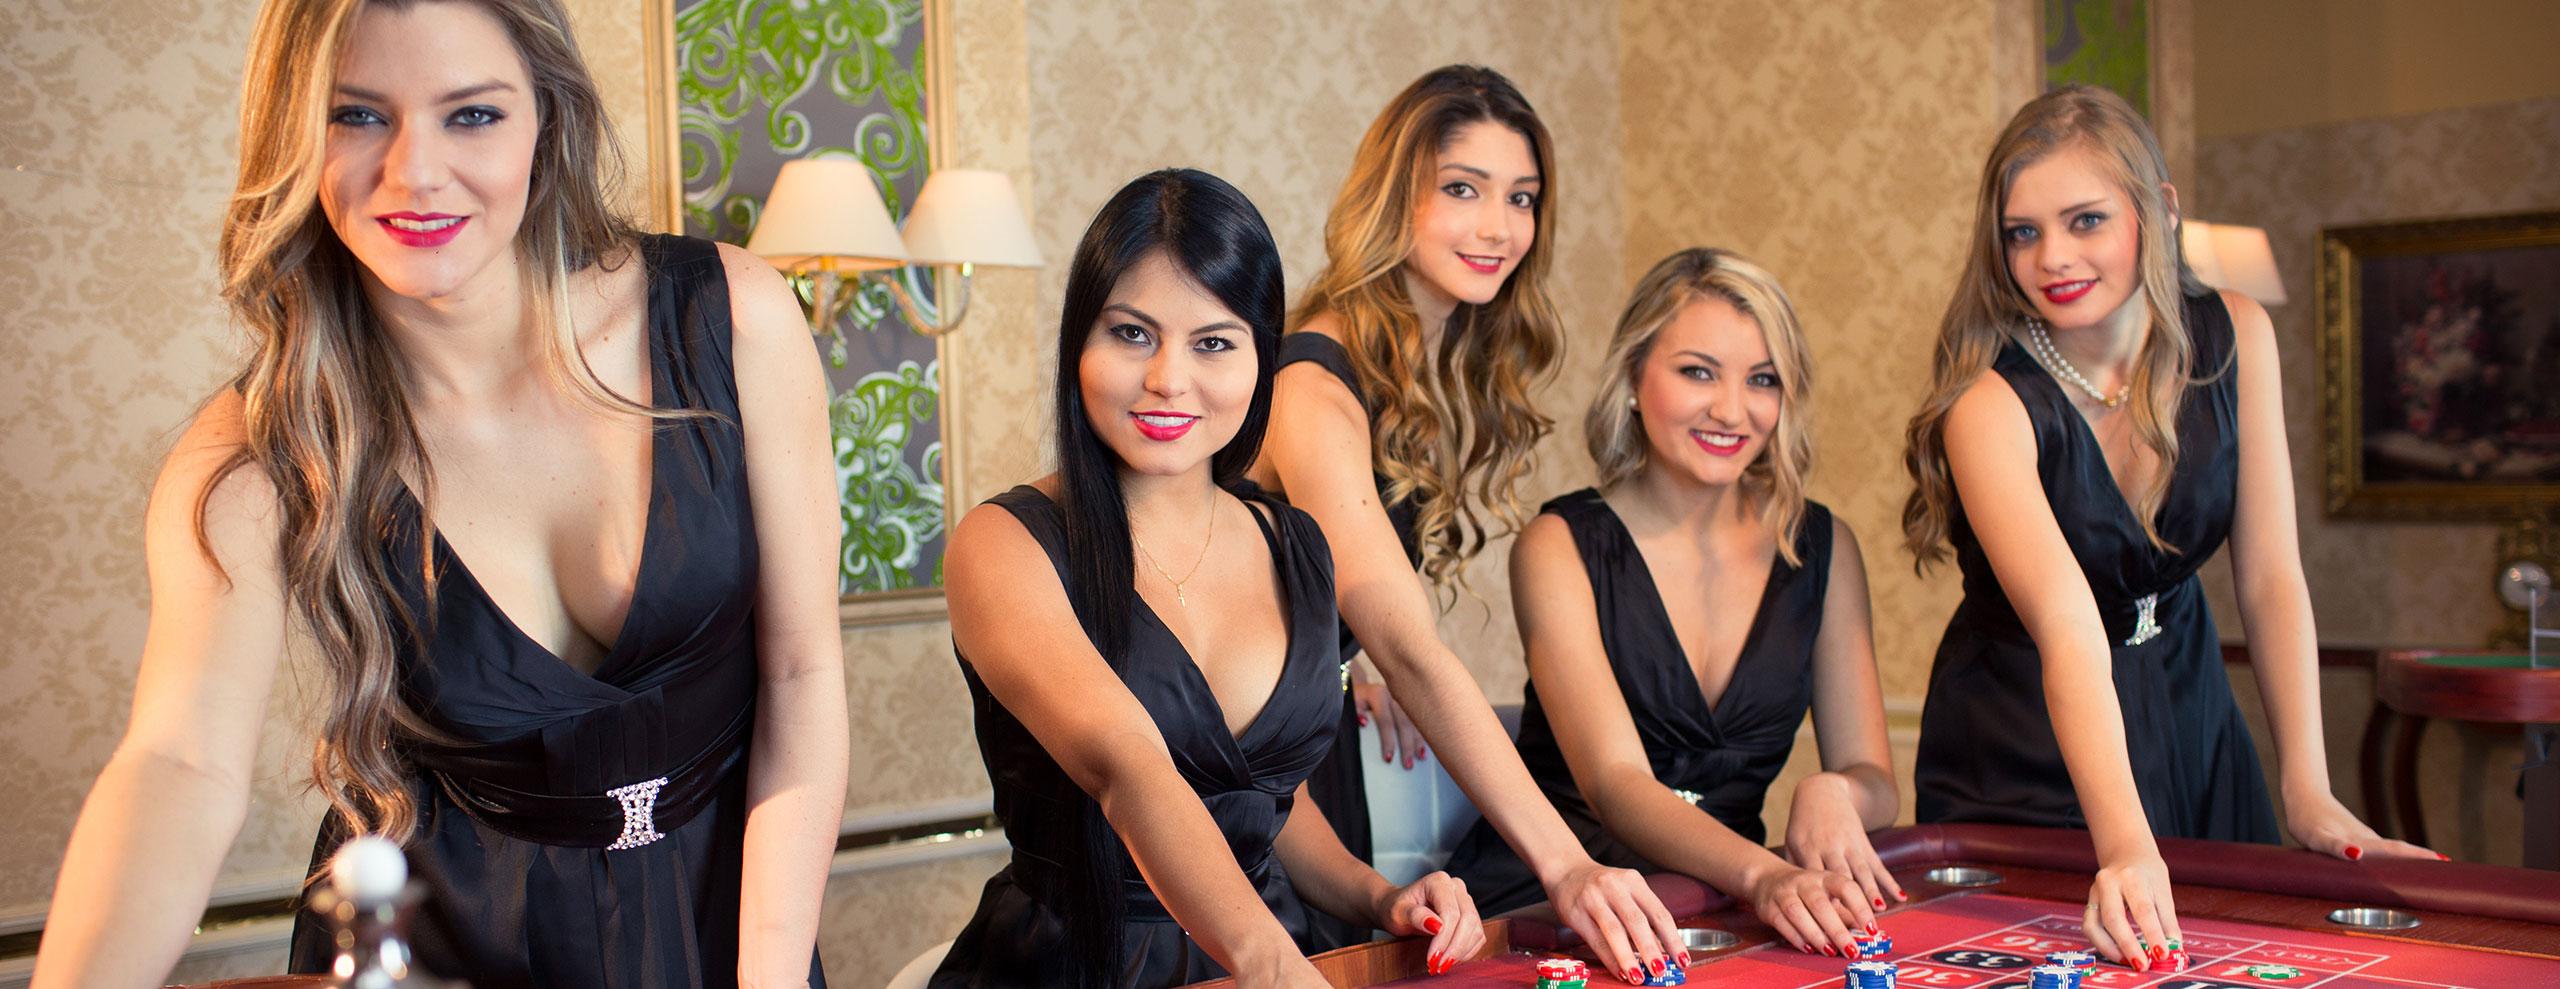 QQ Poker Online - Situs Judi Resmi IDNPOKER Terpercaya